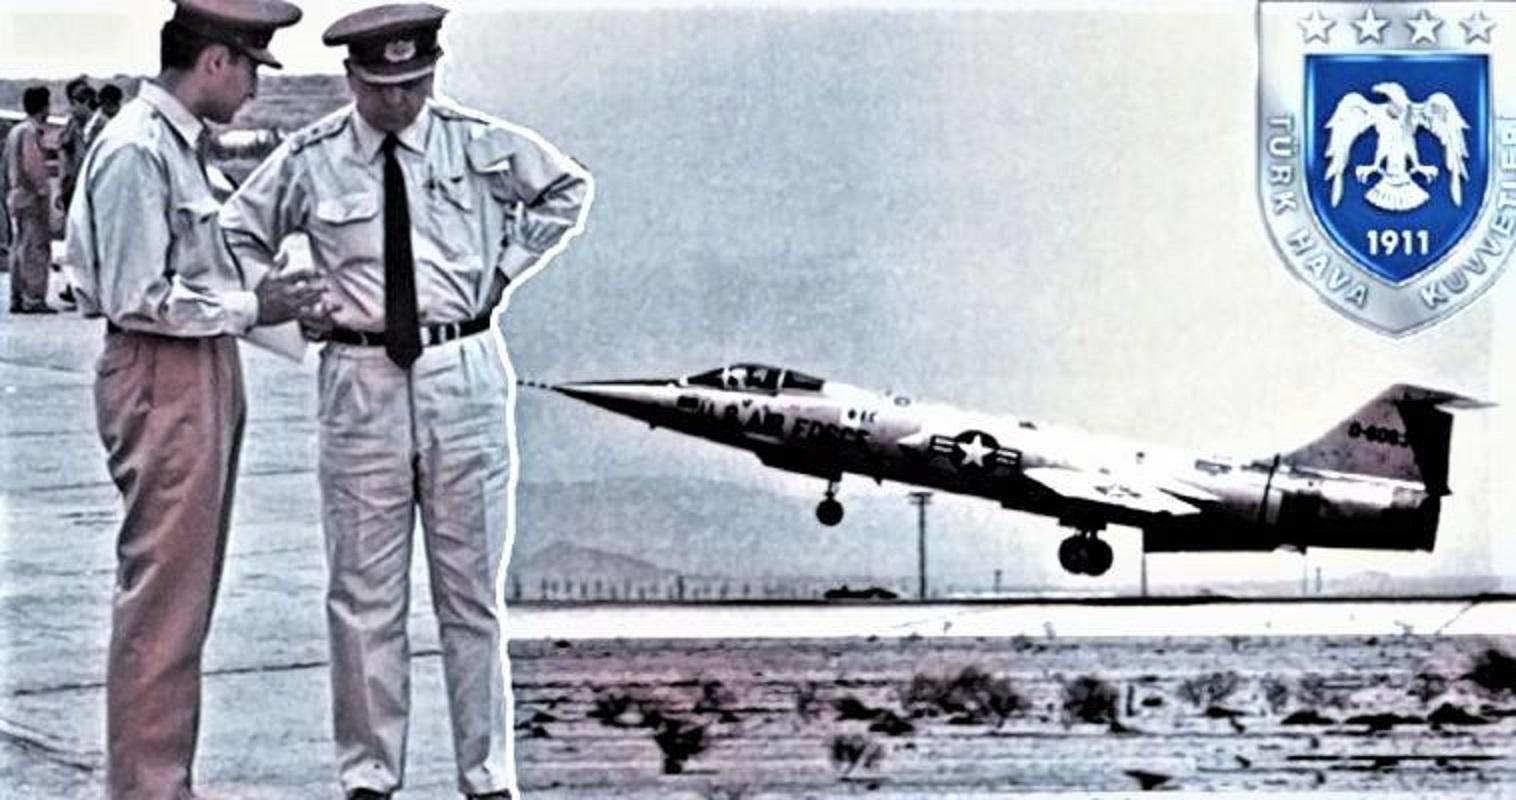 F-104 και Φρεγάτες MMSC: Η χειρότερη αγορά του Τουρκικού Στρατού – Μάθημα για την Ελλάδα